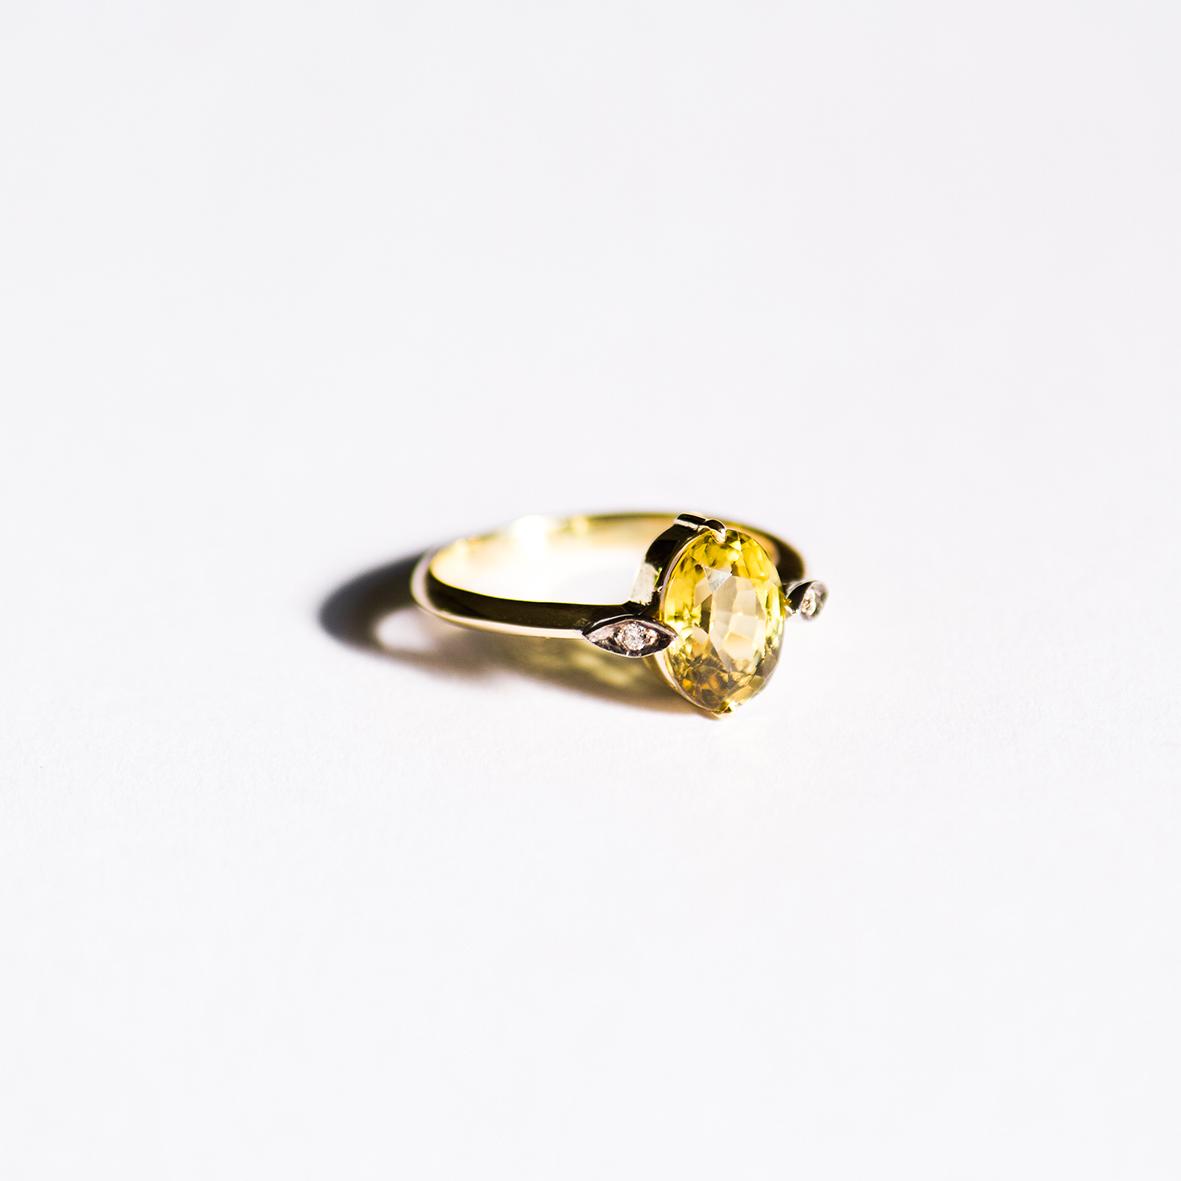 5. OONA_gems of ceylon_ficha1_sinhalite ring